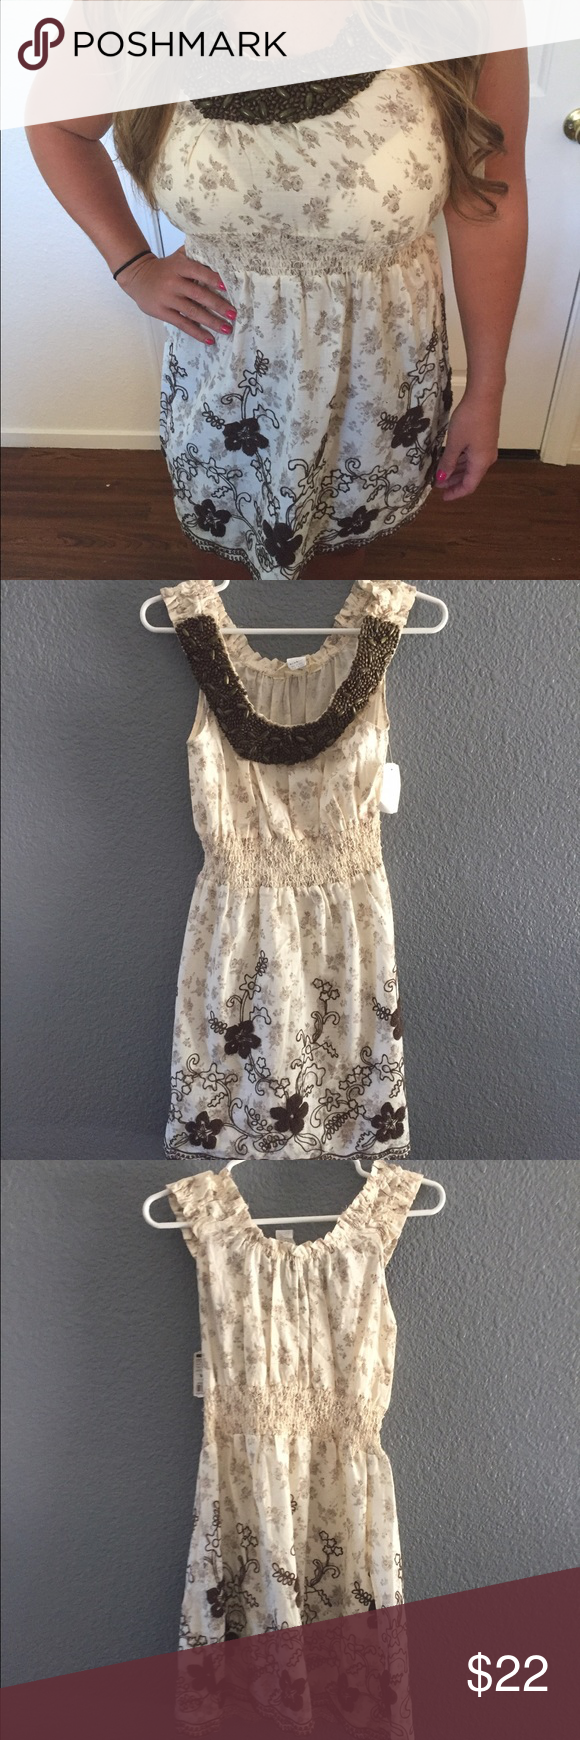 Cream beaded dress Brand new w tags Uno core Dresses Mini